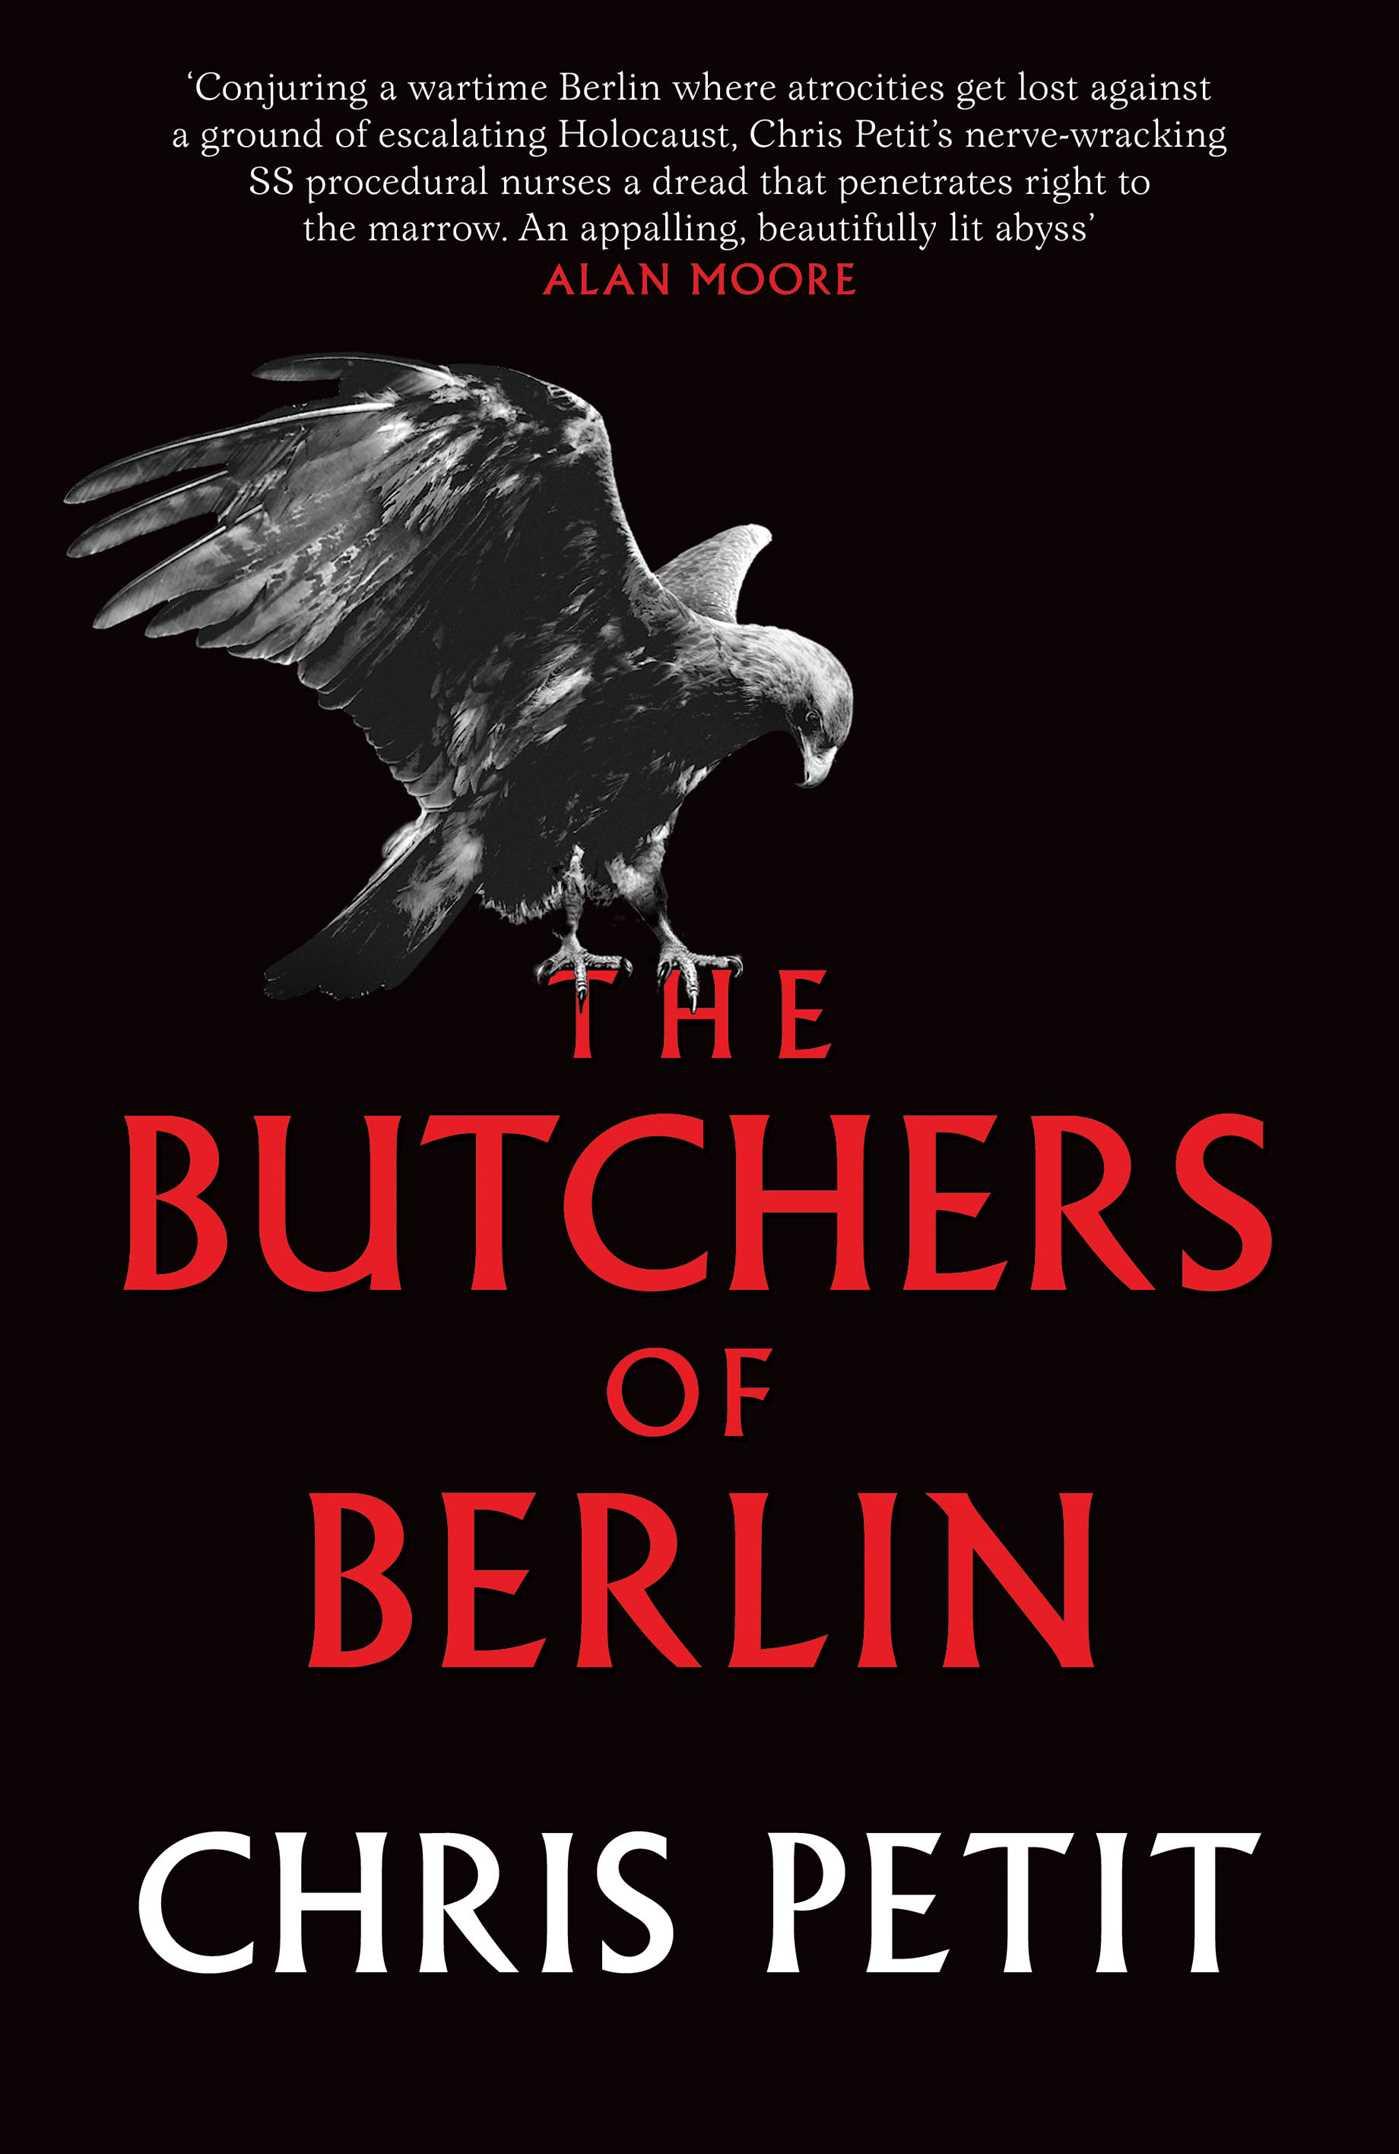 The butchers of berlin 9781471143403 hr